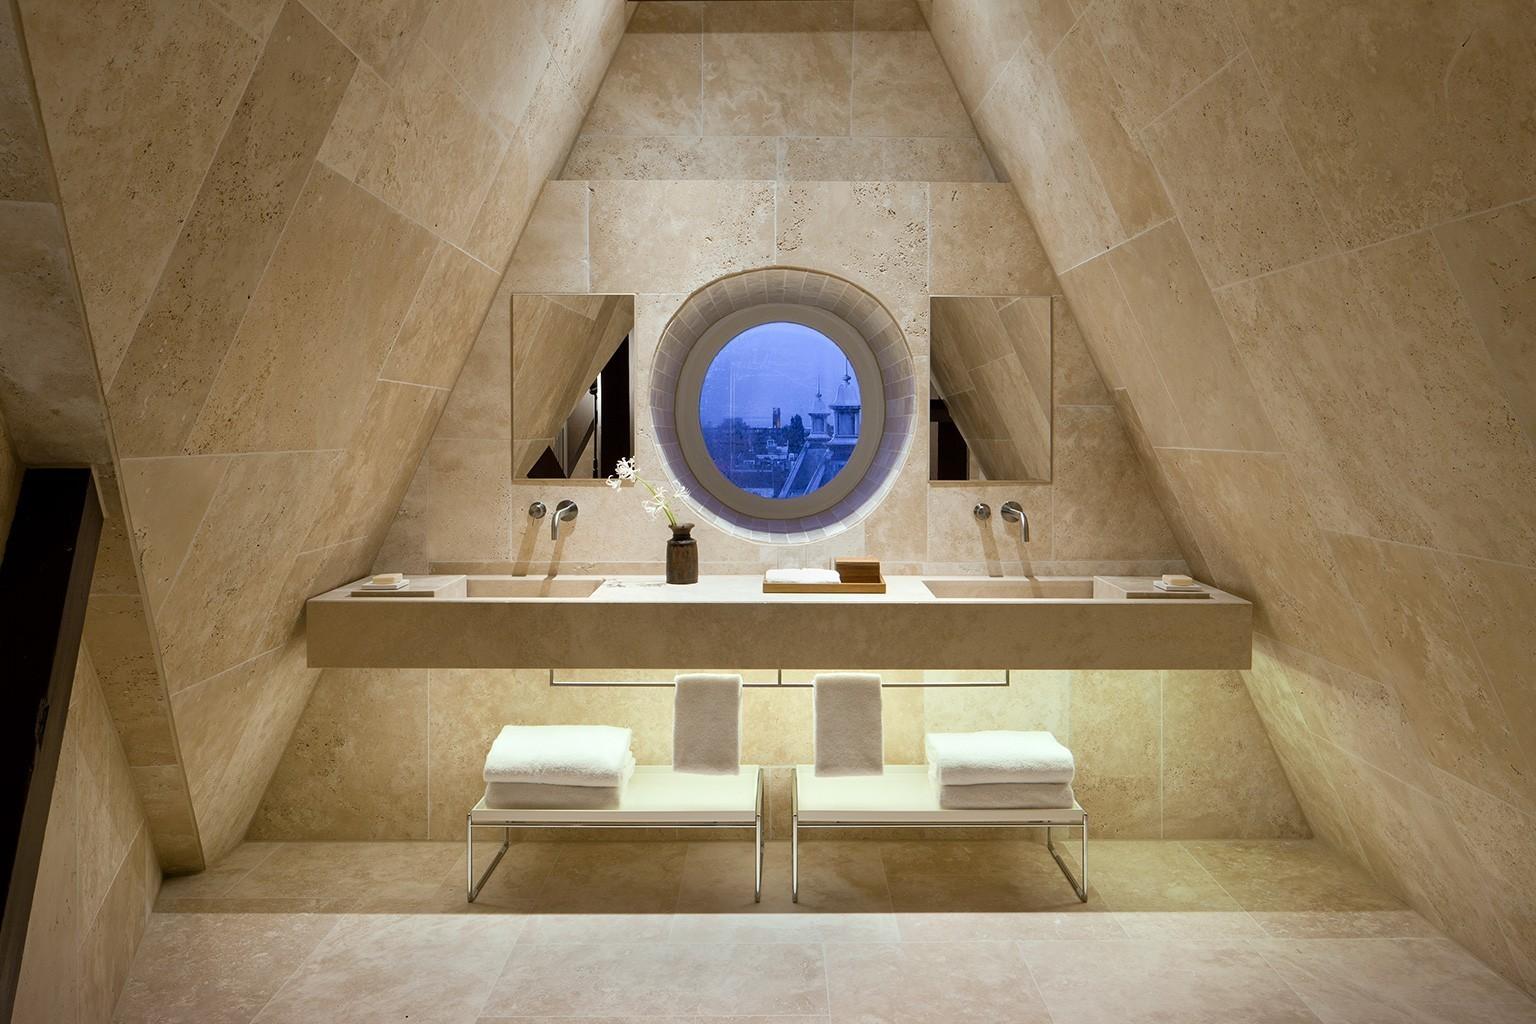 Conservatorium hotel in amsterdam designreisen for Designhotel niederlande